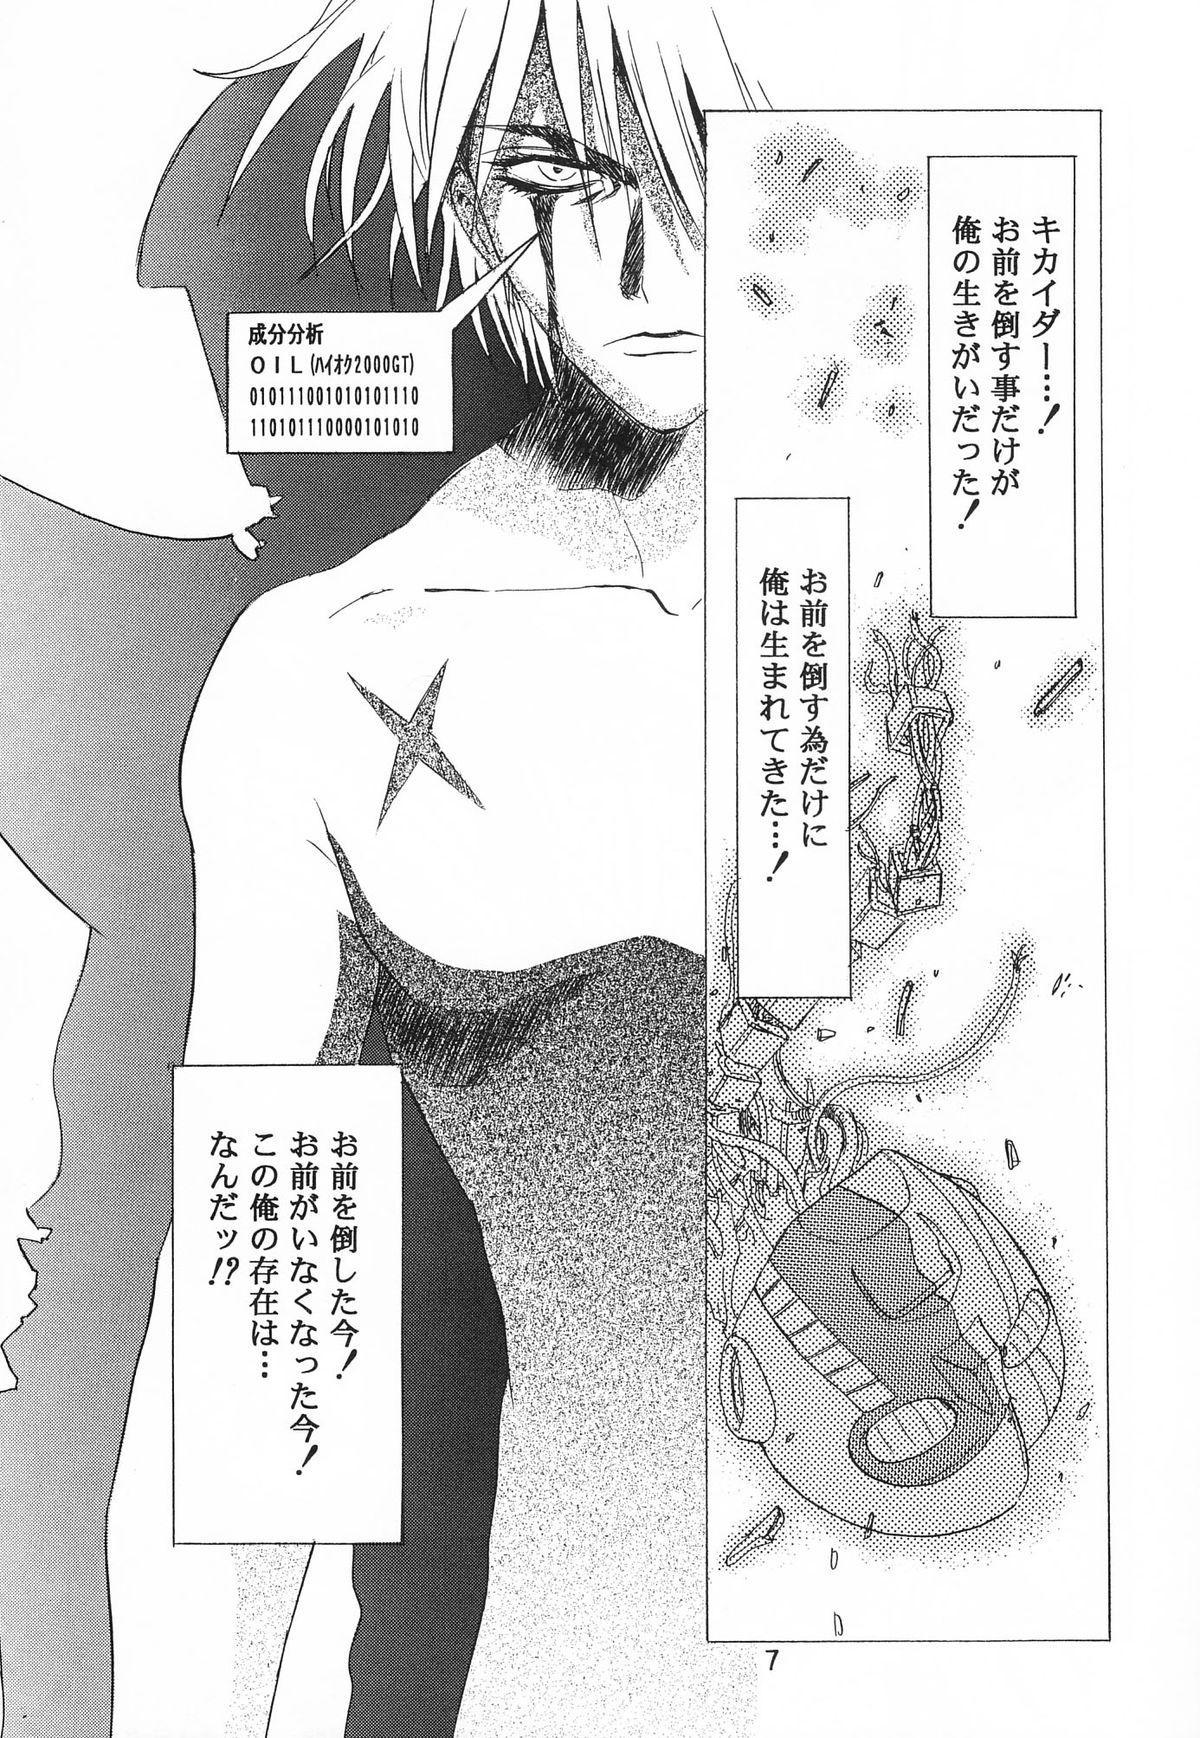 Henrei-kai '98 Natsu SPECIAL 8